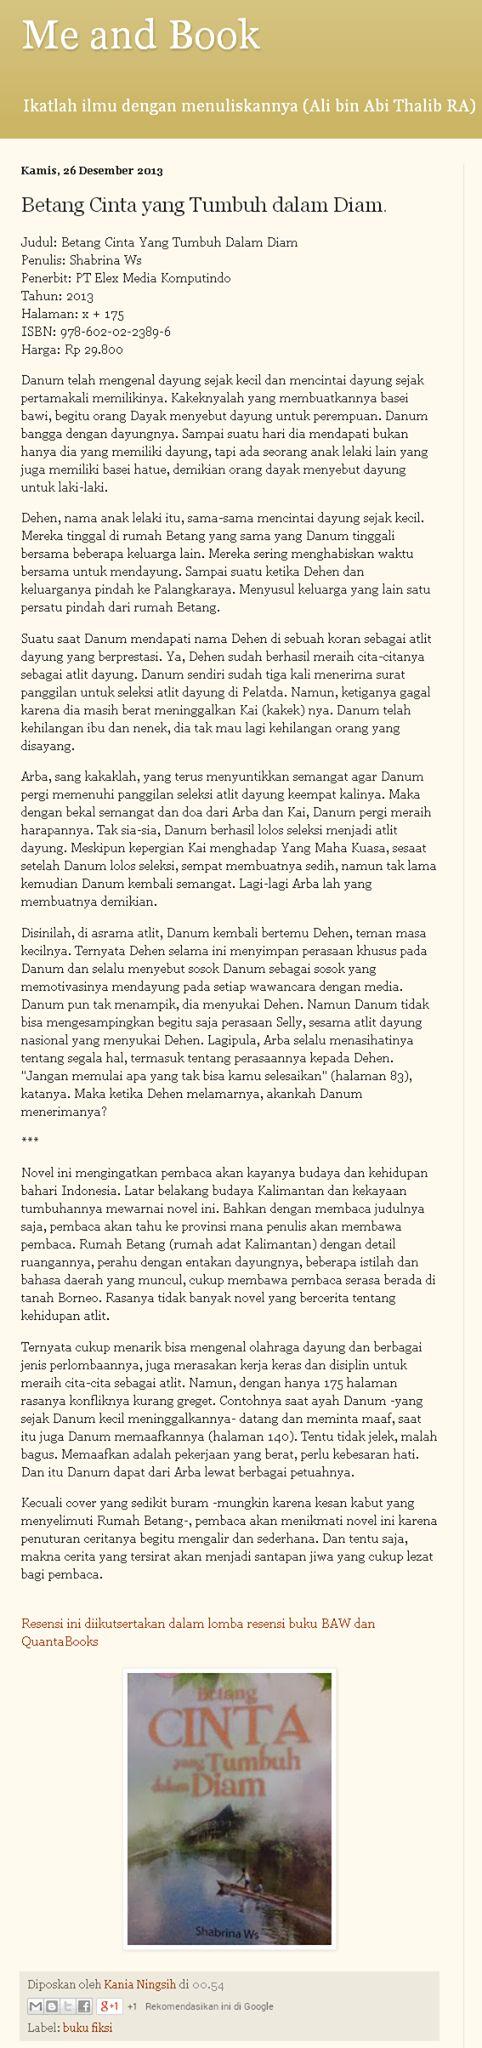 "#ReviewBuku Novel Islami Quanta ""BETANG: Cinta yang Tumbuh dalam Diam"" karya Shabrina Ws oleh Blogger Kania Ningsih (Blogspot @kaniadanbuku)   ""...pembaca akan menikmati novel ini karena penuturan ceritanya begitu mengalir dan sederhana. Dan tentu saja, makna cerita yang tersirat akan menjadi santapan jiwa yang cukup lezat bagi pembaca...""  /via twitter @ShabrinaWs"